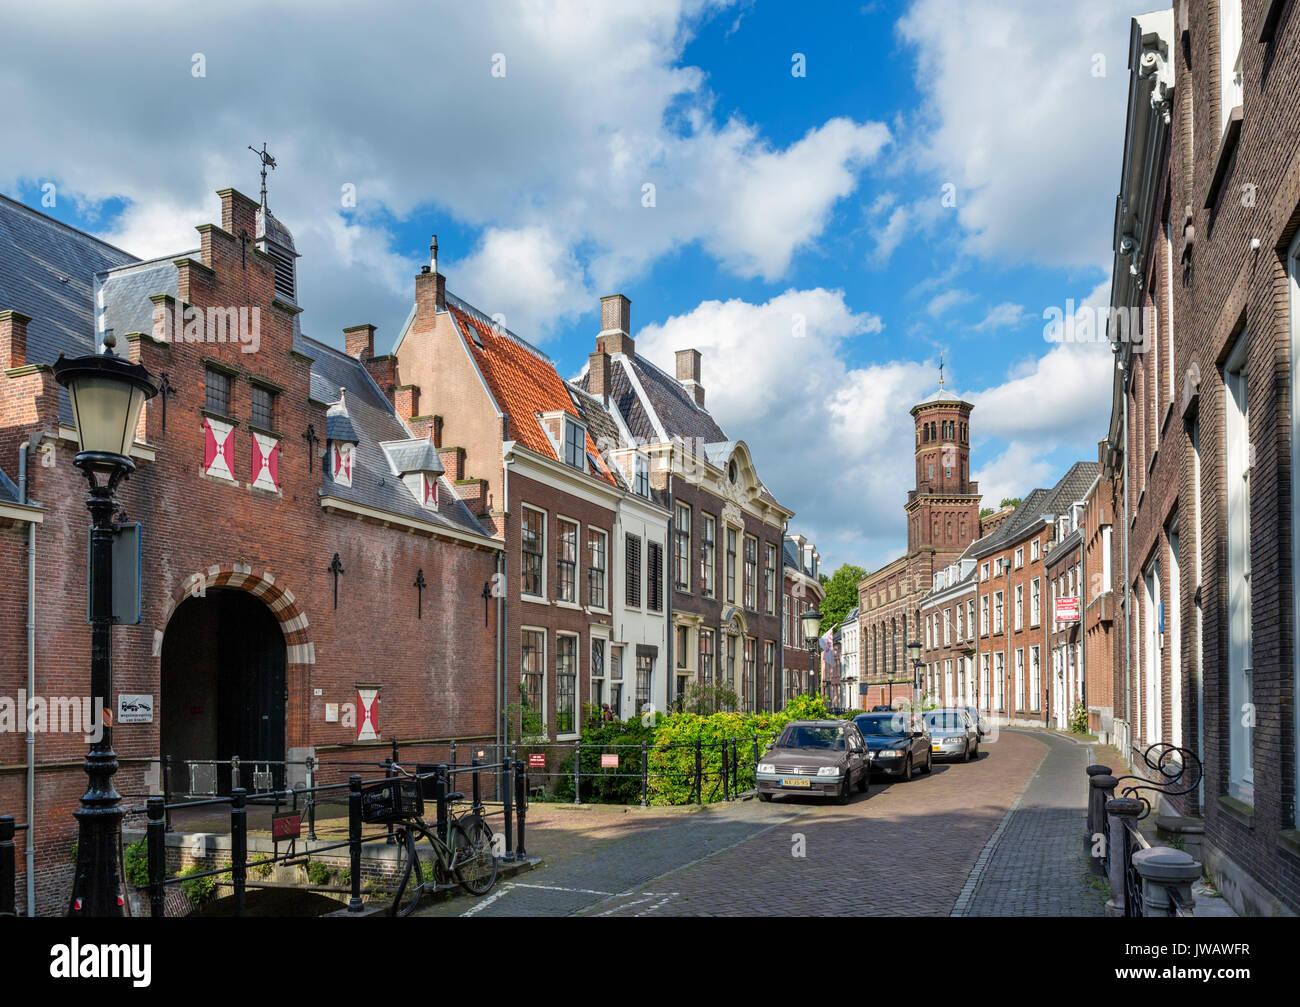 Kromme Nieuwegracht, a picturesque street in the historic city centre, Utrecht, Netherlands - Stock Image